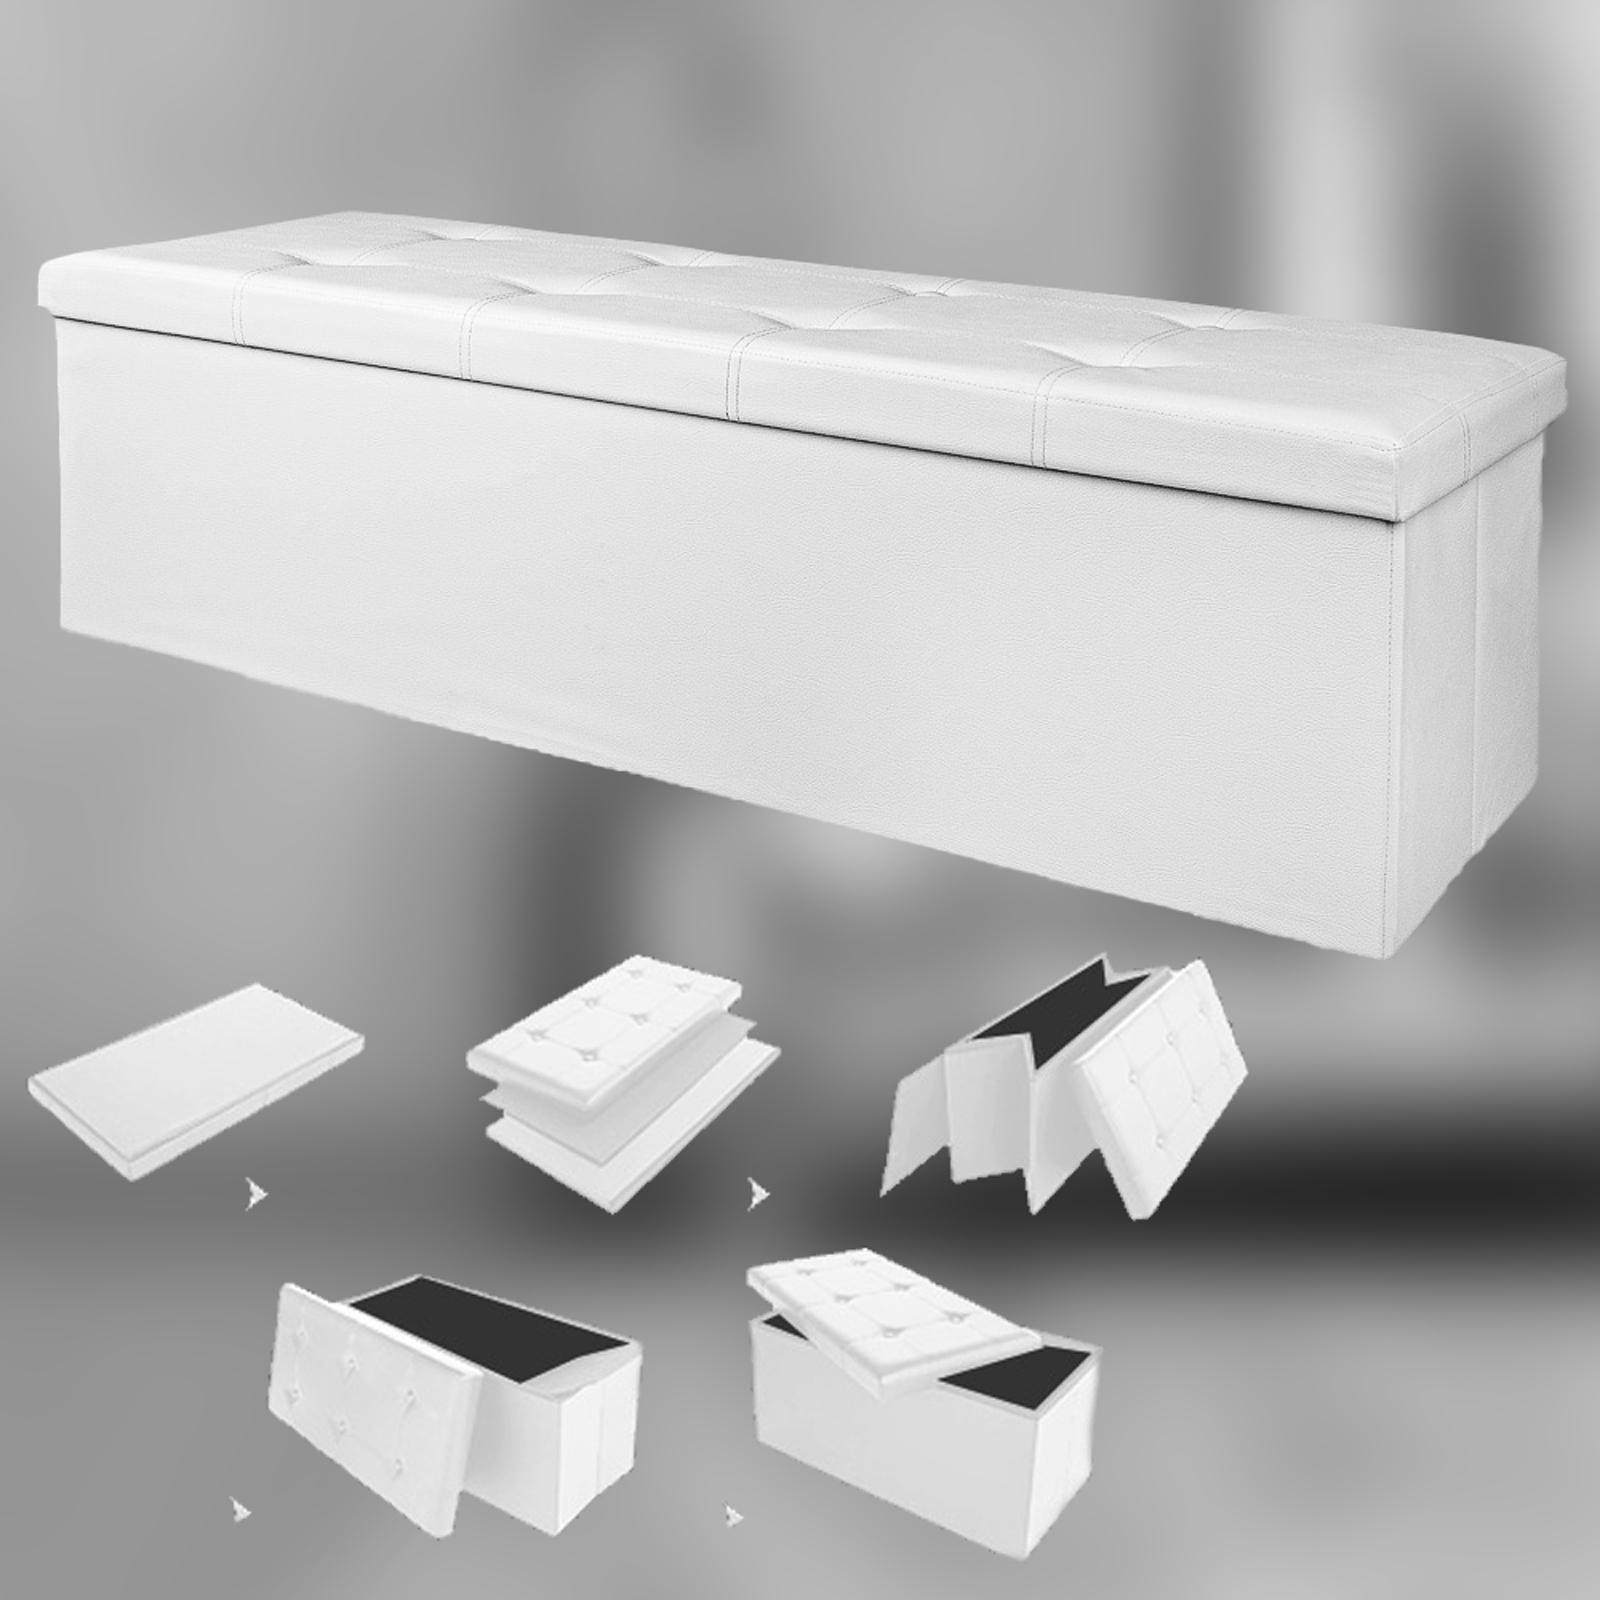 Xl Stool Seat Storage Ottoman Box Chest Trunk Large